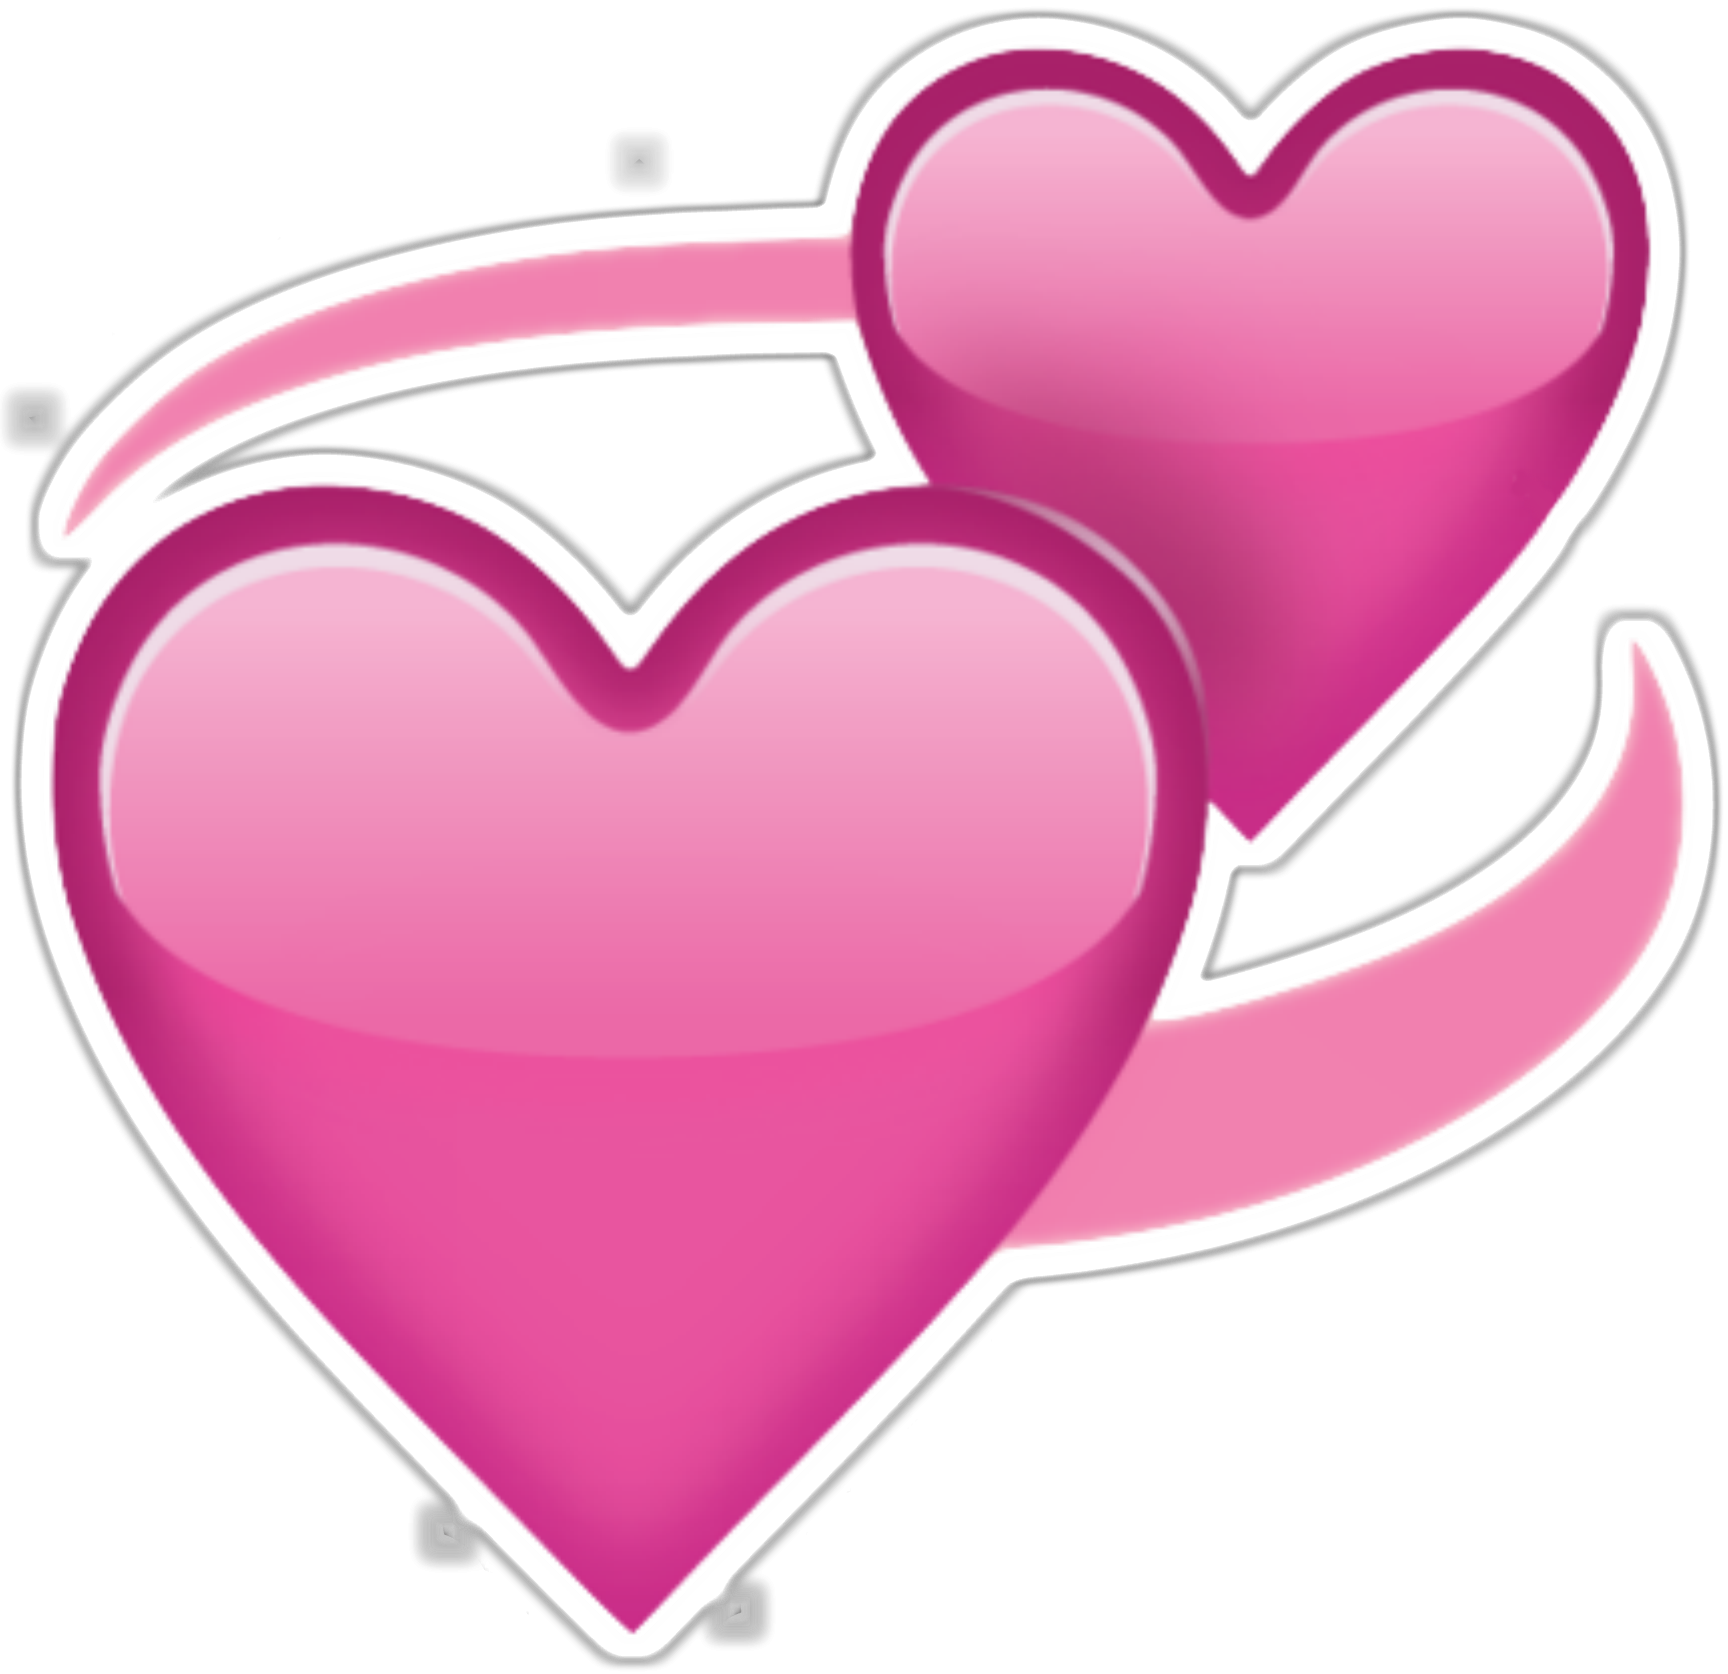 Two Pink Hearts Emoji Png Transparent